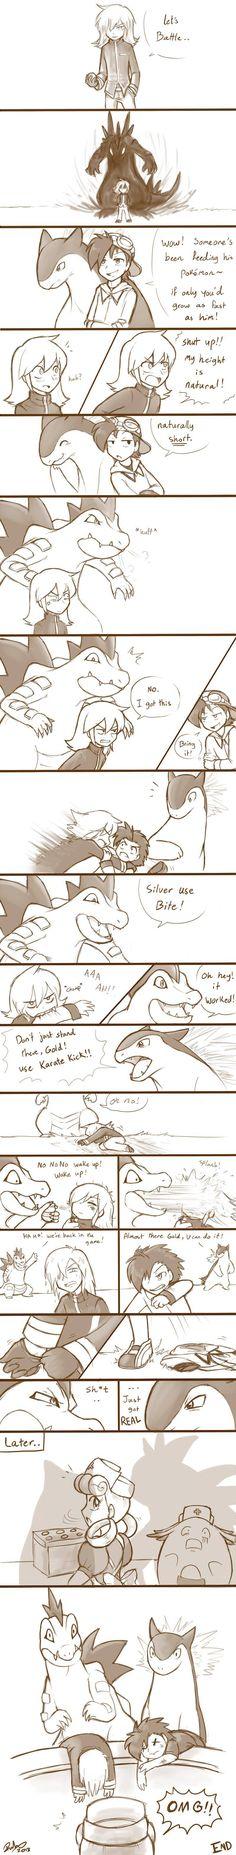 Pokemon - Silver vs Gold. Totally worth the read.